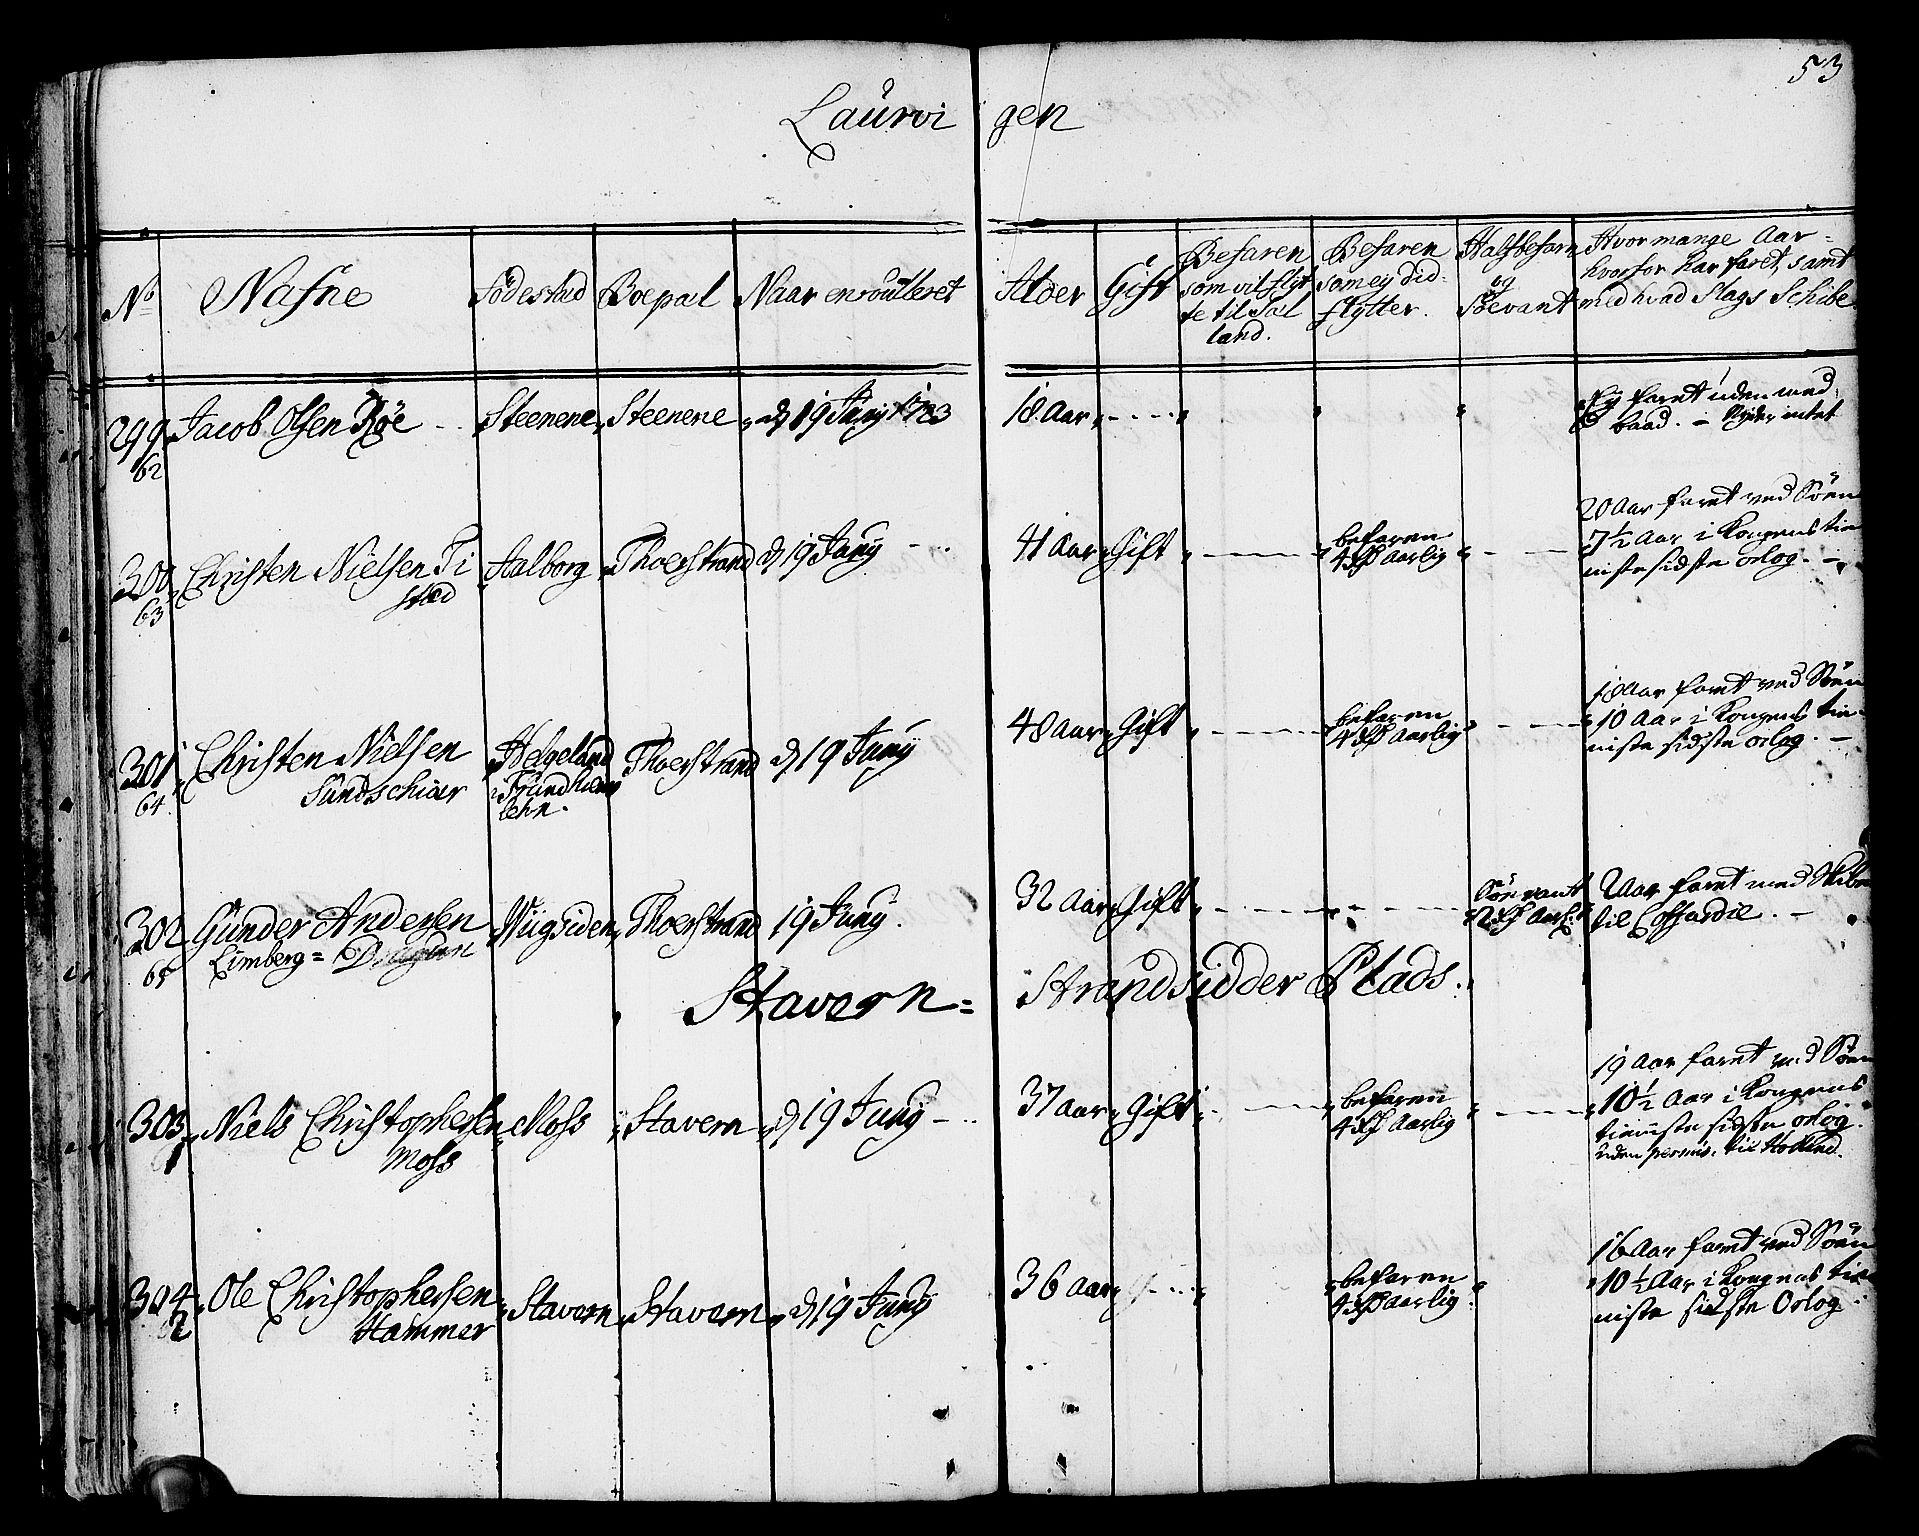 SAKO, Drammen innrulleringsdistrikt, F/Fa/L0002: Hovedrulle, 1723-1726, p. 54